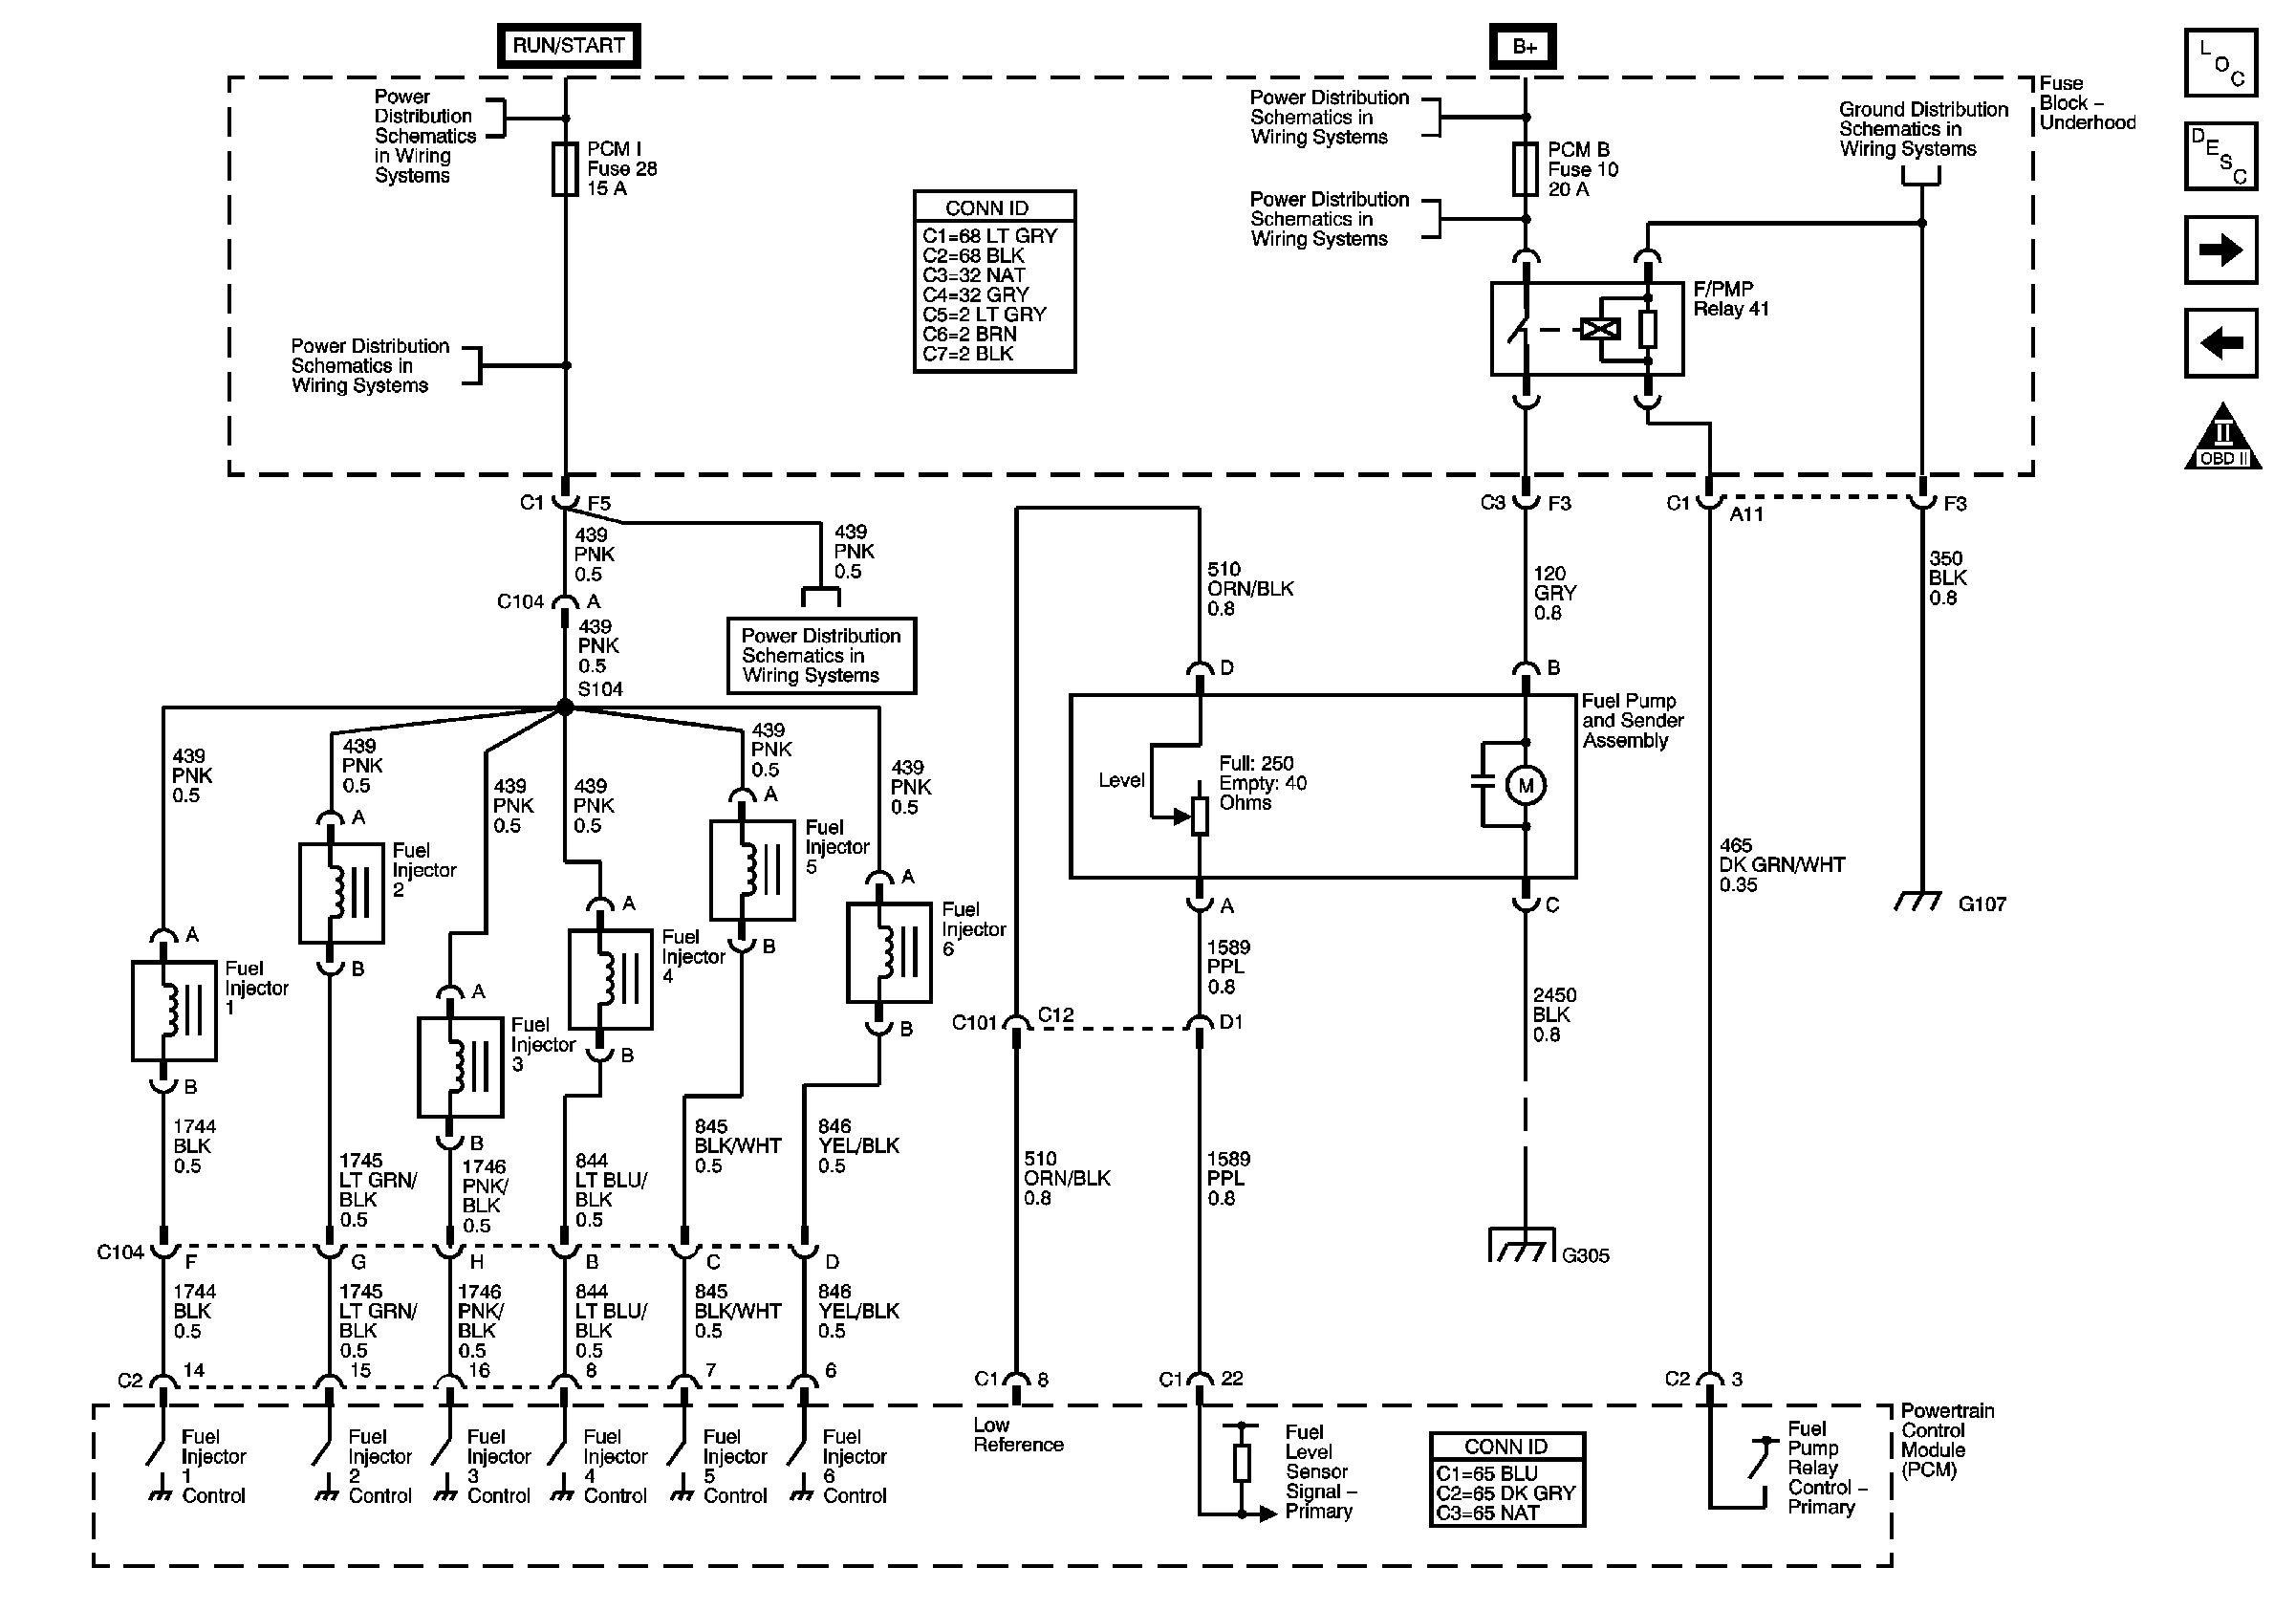 2006 Chevy Traiblazer Taillight Schematics Awesome In 2020 Diagram Chevrolet Trailblazer Schematic Drawing